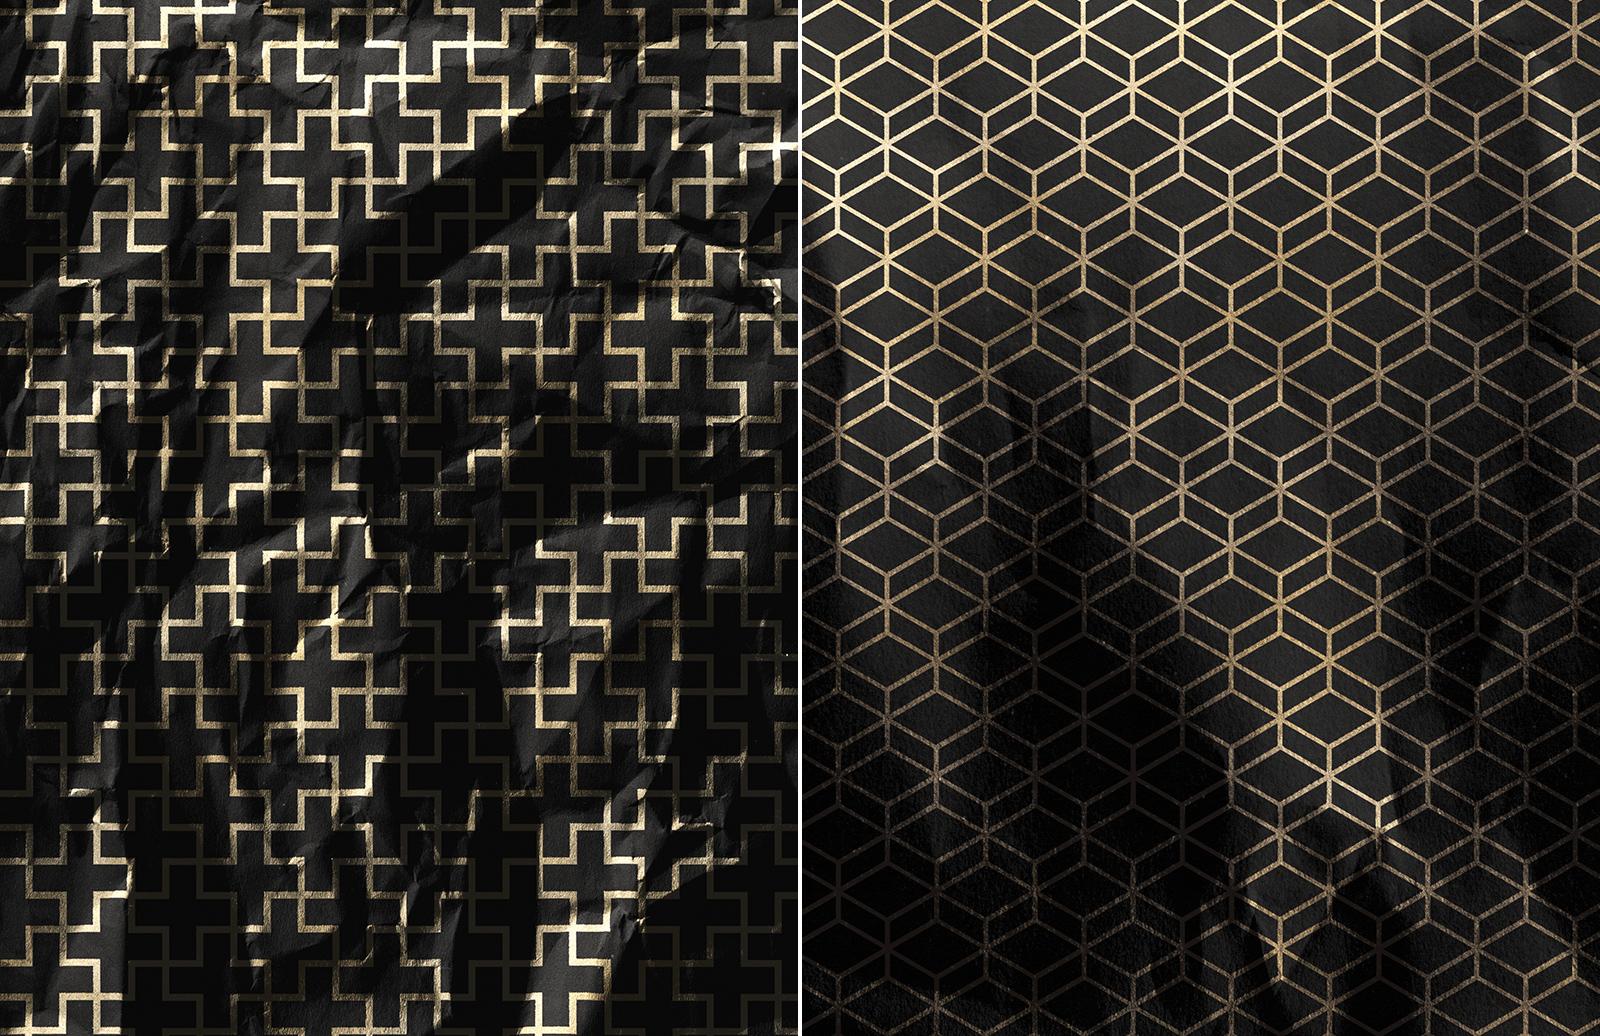 Large Gold  Foil  Paper  Textures  Preview 5